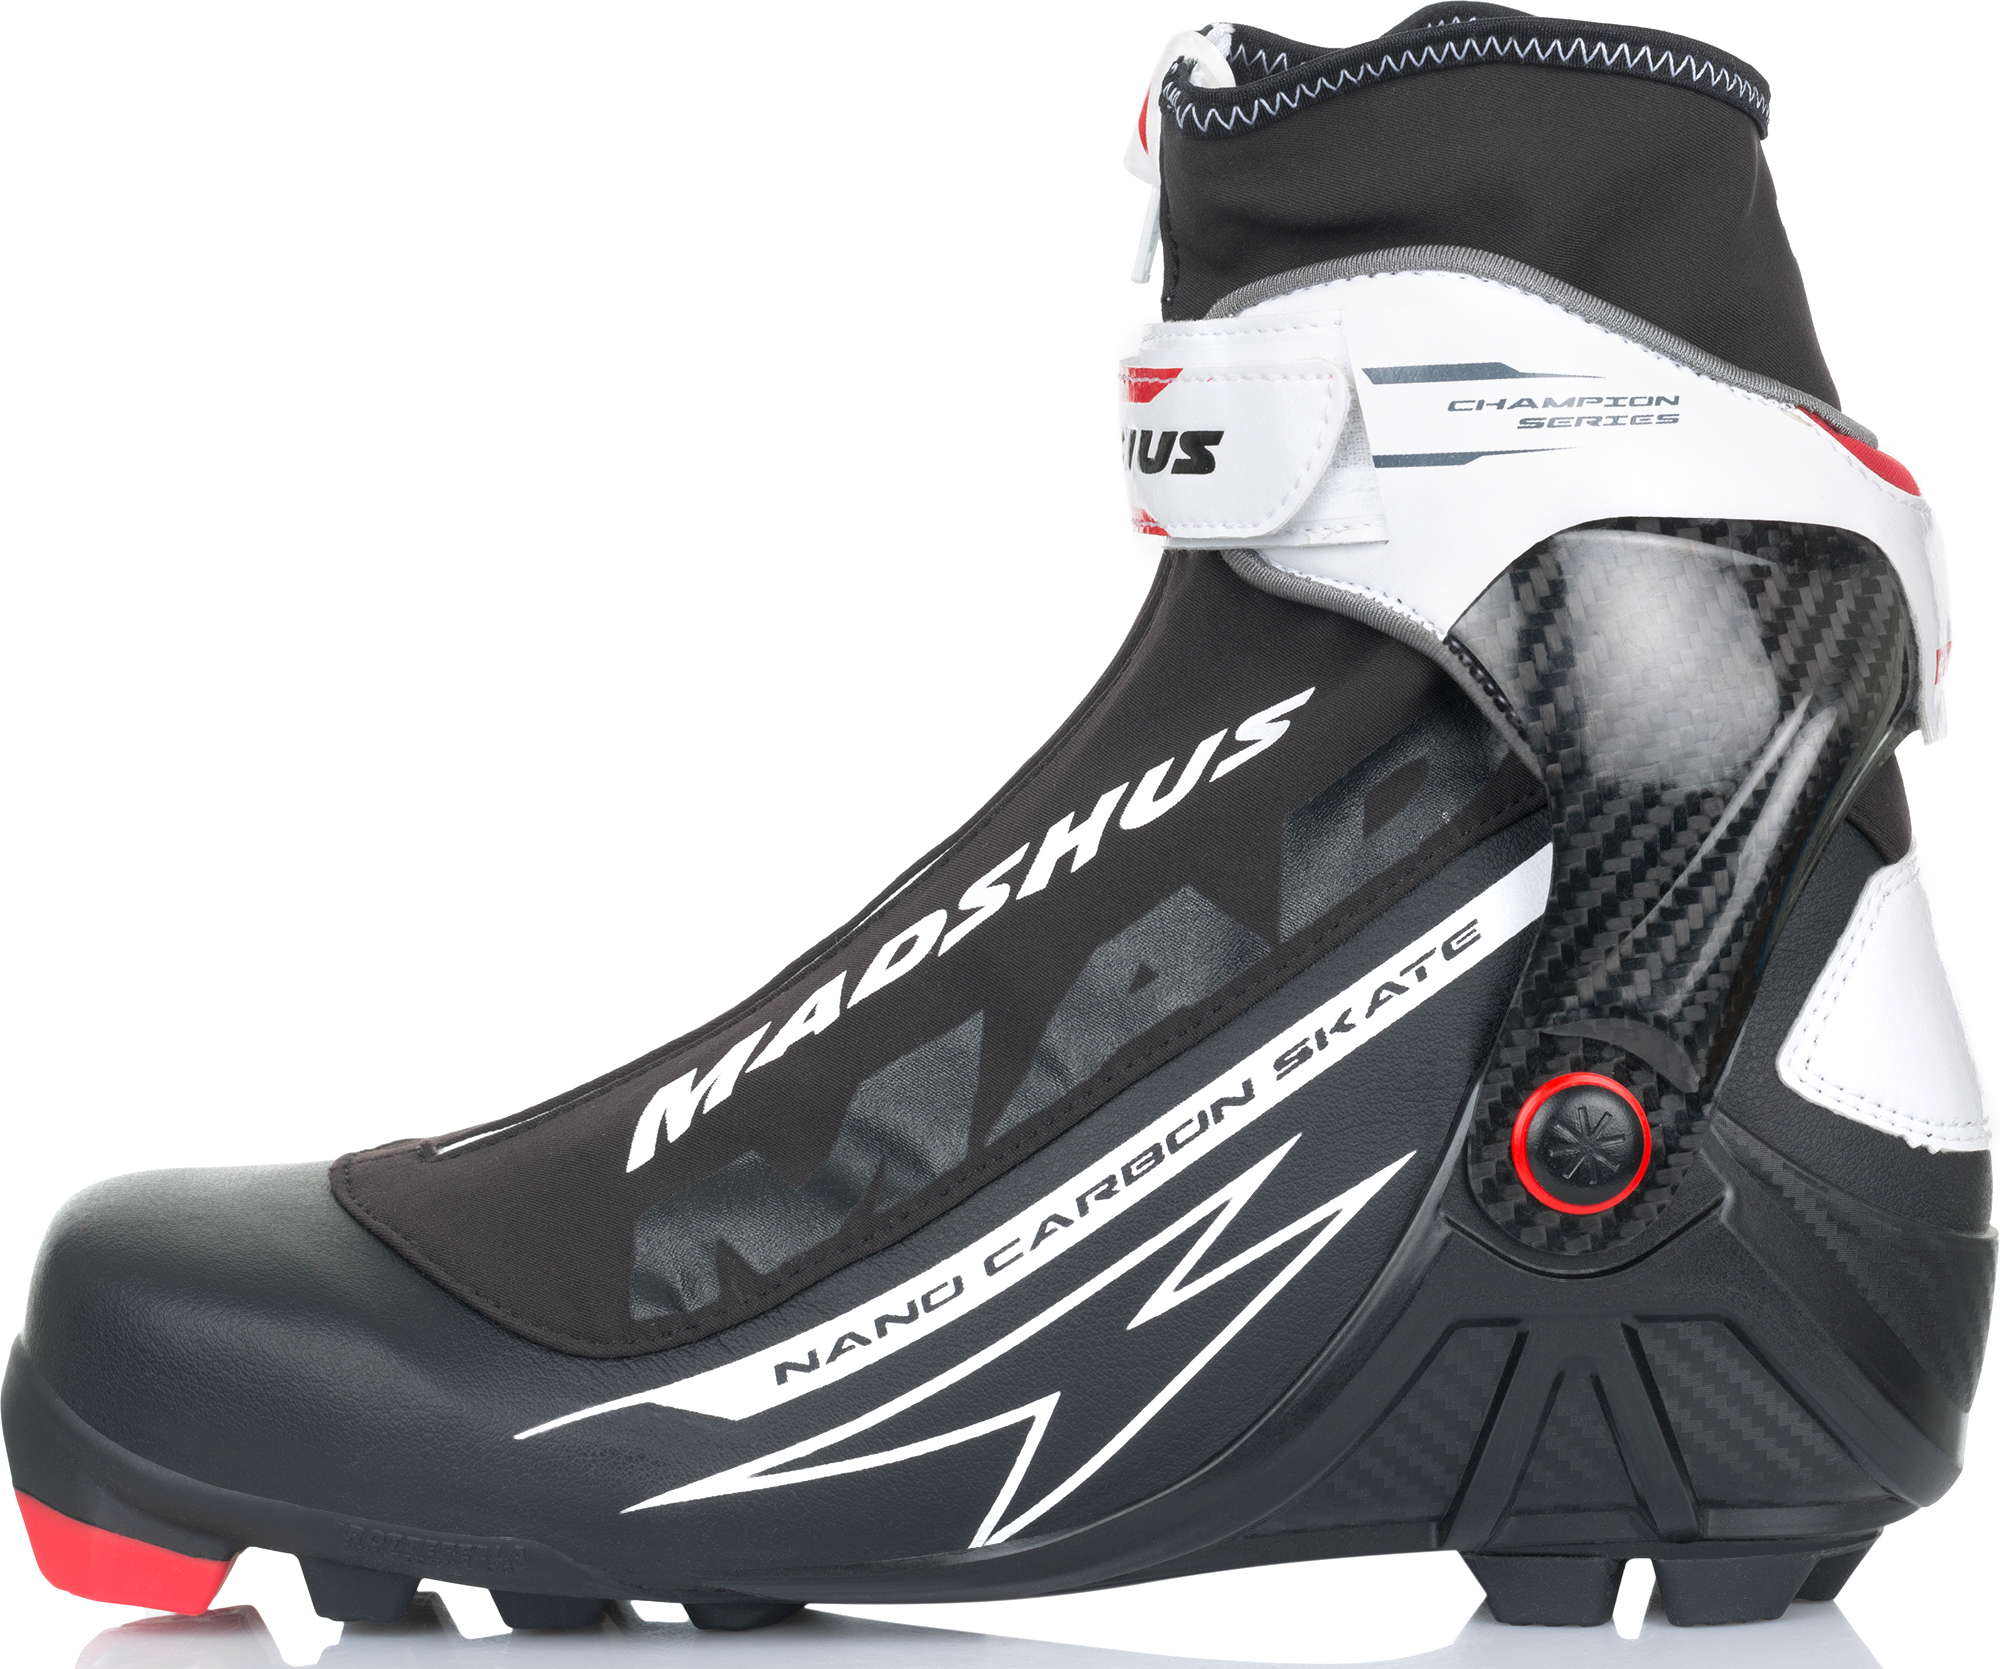 Madshus Ботинки для беговых лыж Madshus Nano Carbon Skate цена